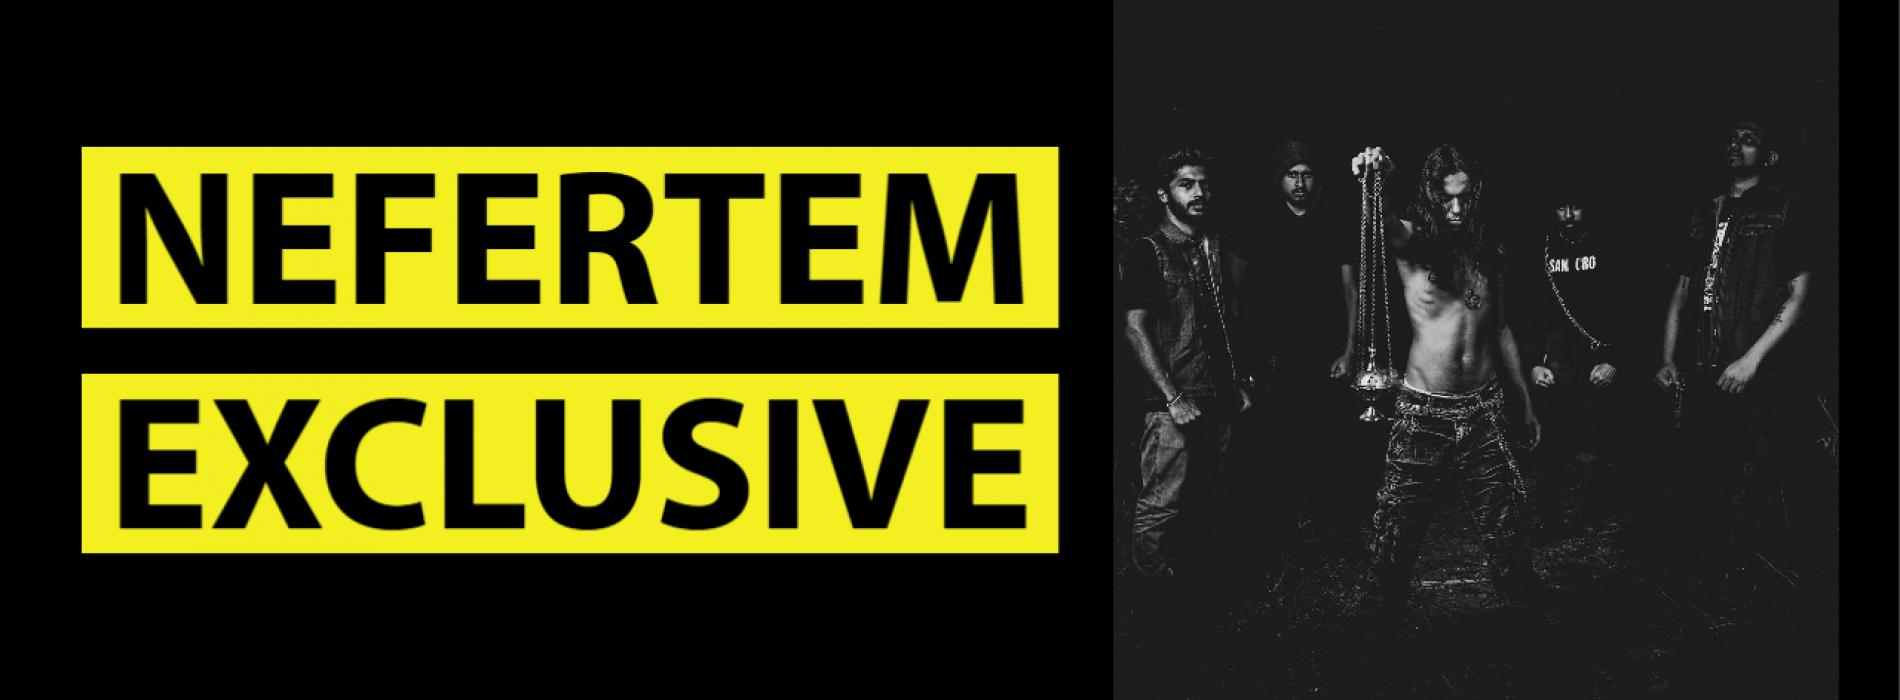 Exclusive : The Nefertem Concert's First Look